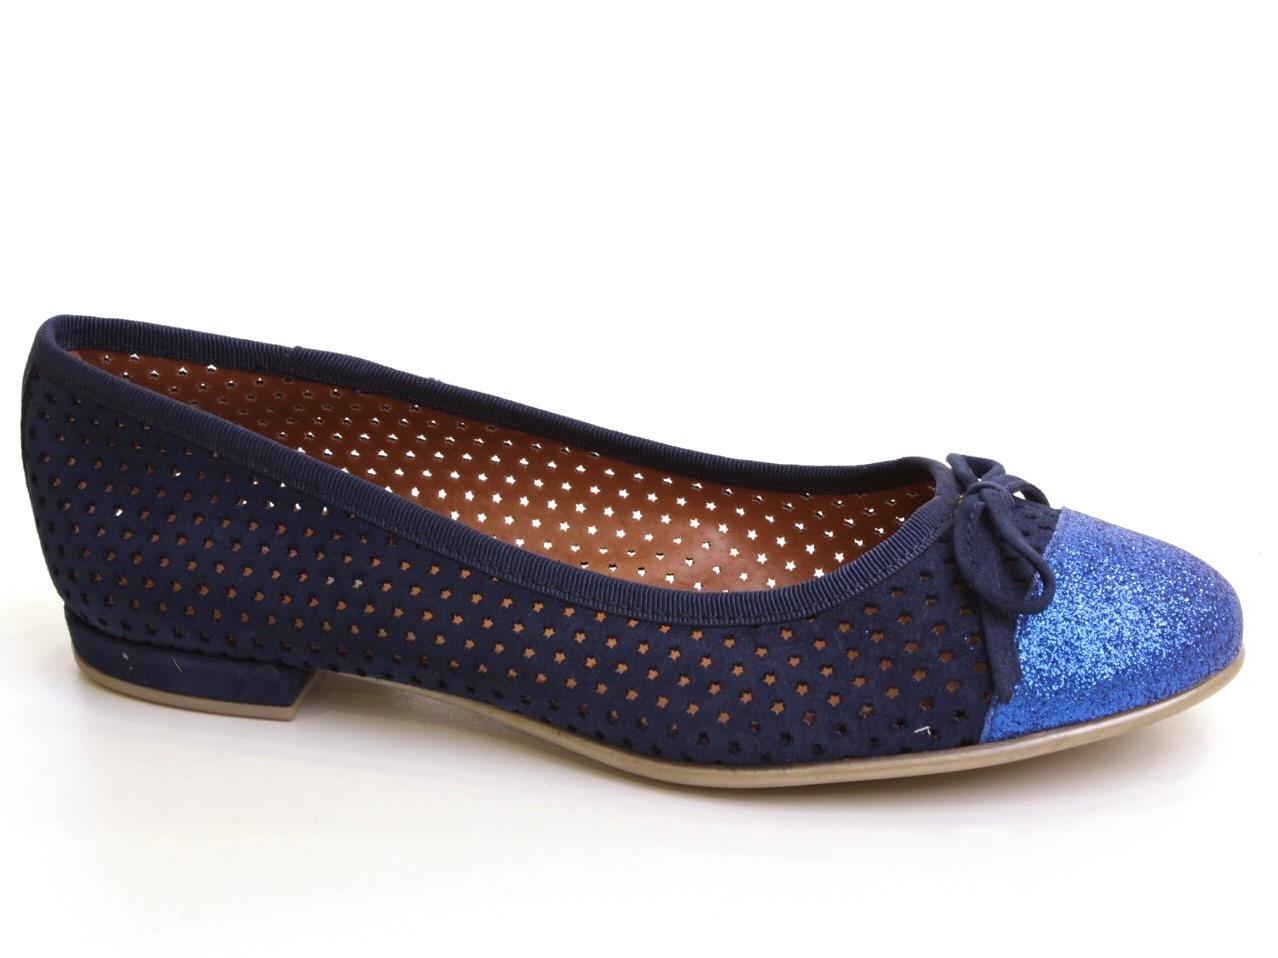 Chaussures Plates, Ballerine, Mocassins Sofia Costa - 085 7853